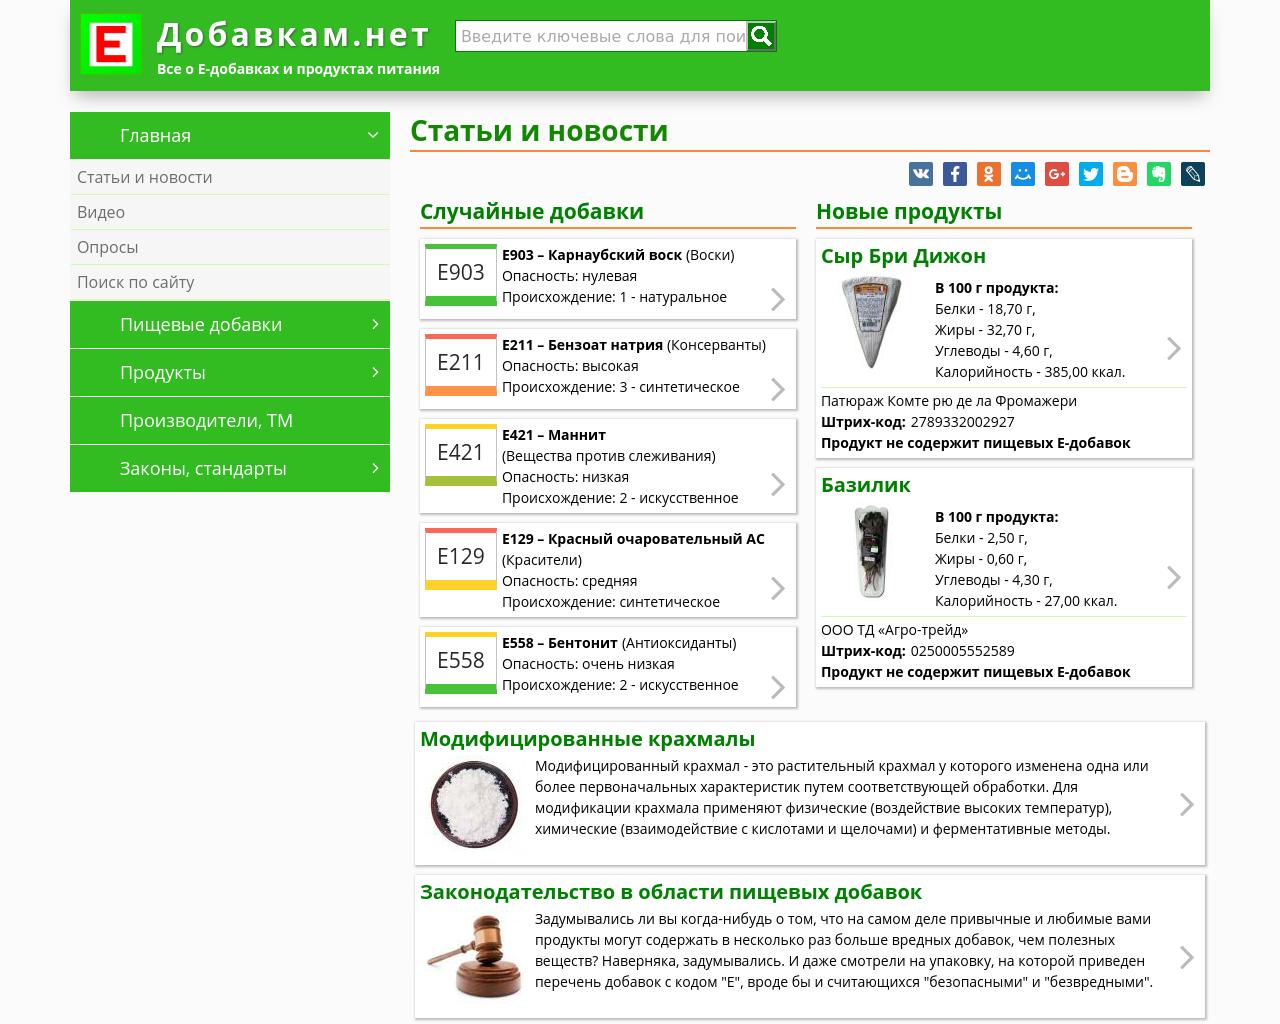 Dobavkam.net-Advertising-Reviews-Pricing